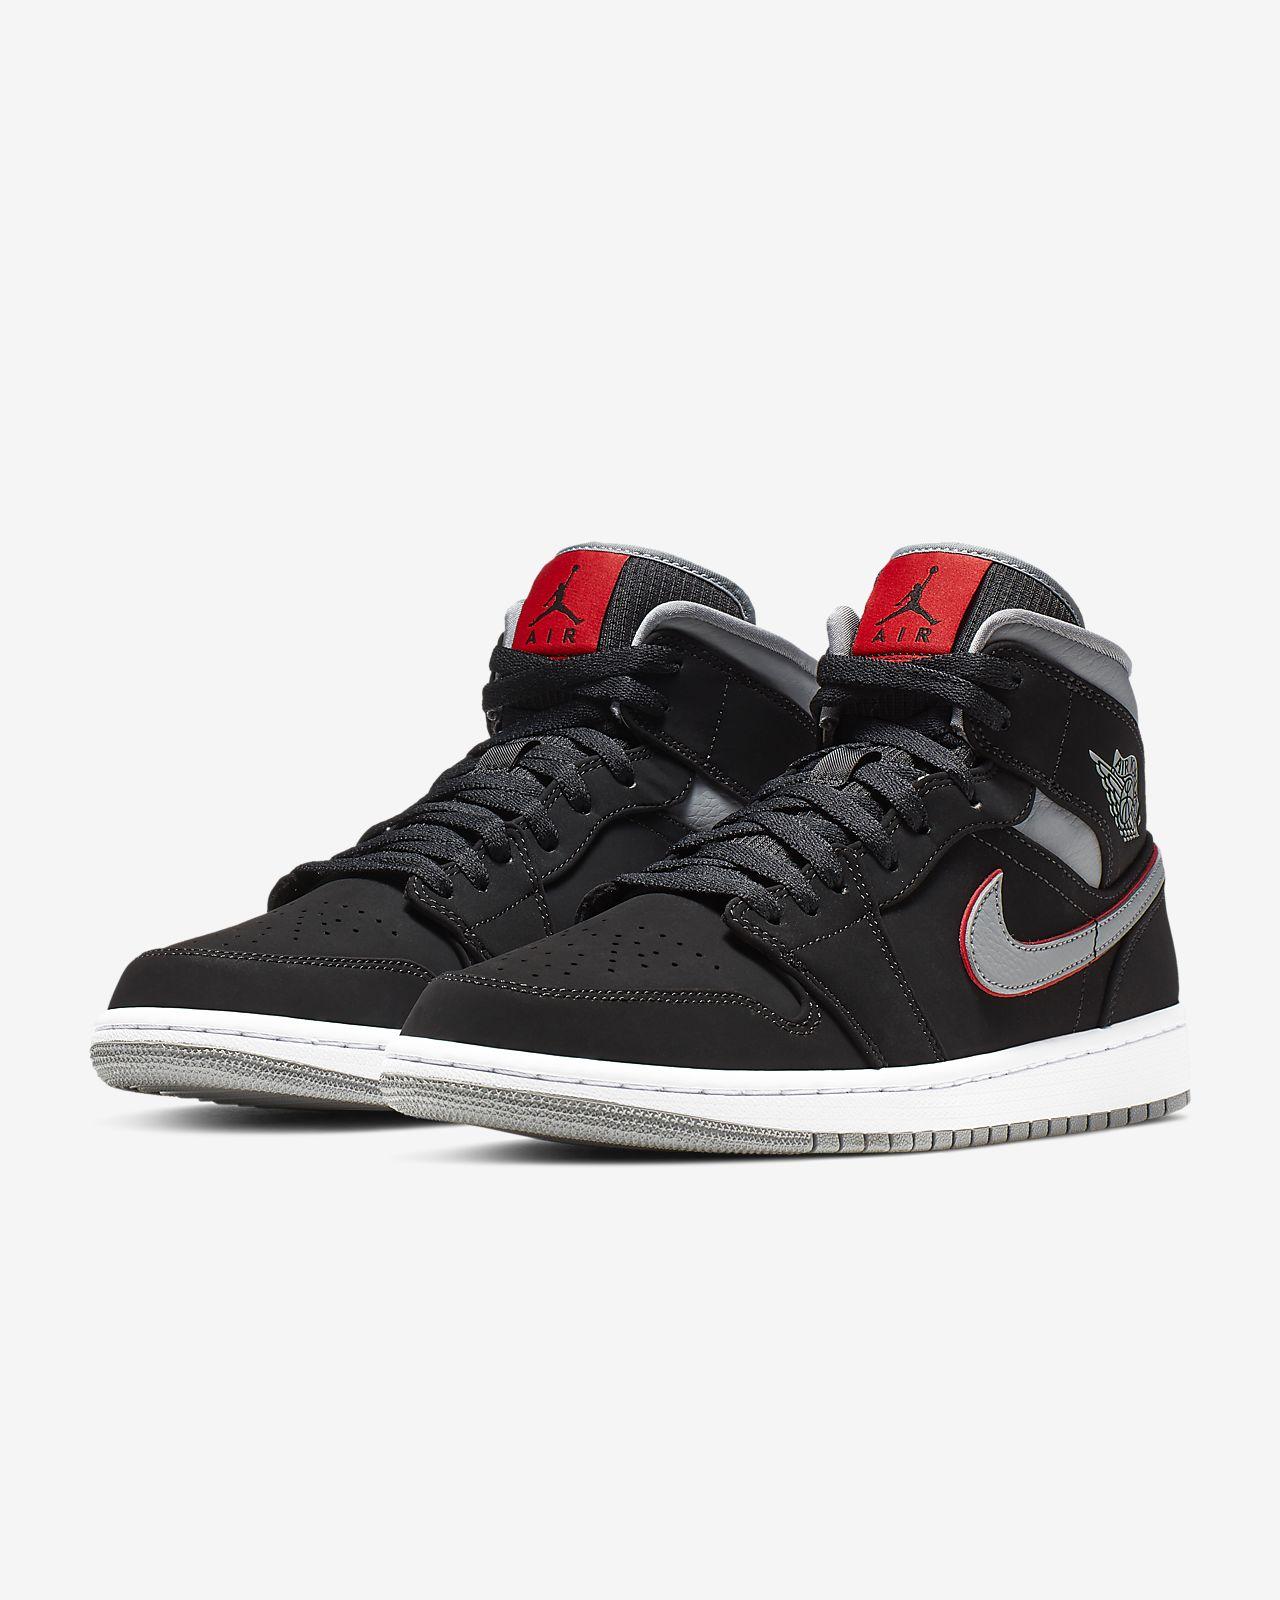 4debbb3075b6e Calzado para hombre Air Jordan 1 Mid. Nike.com MX